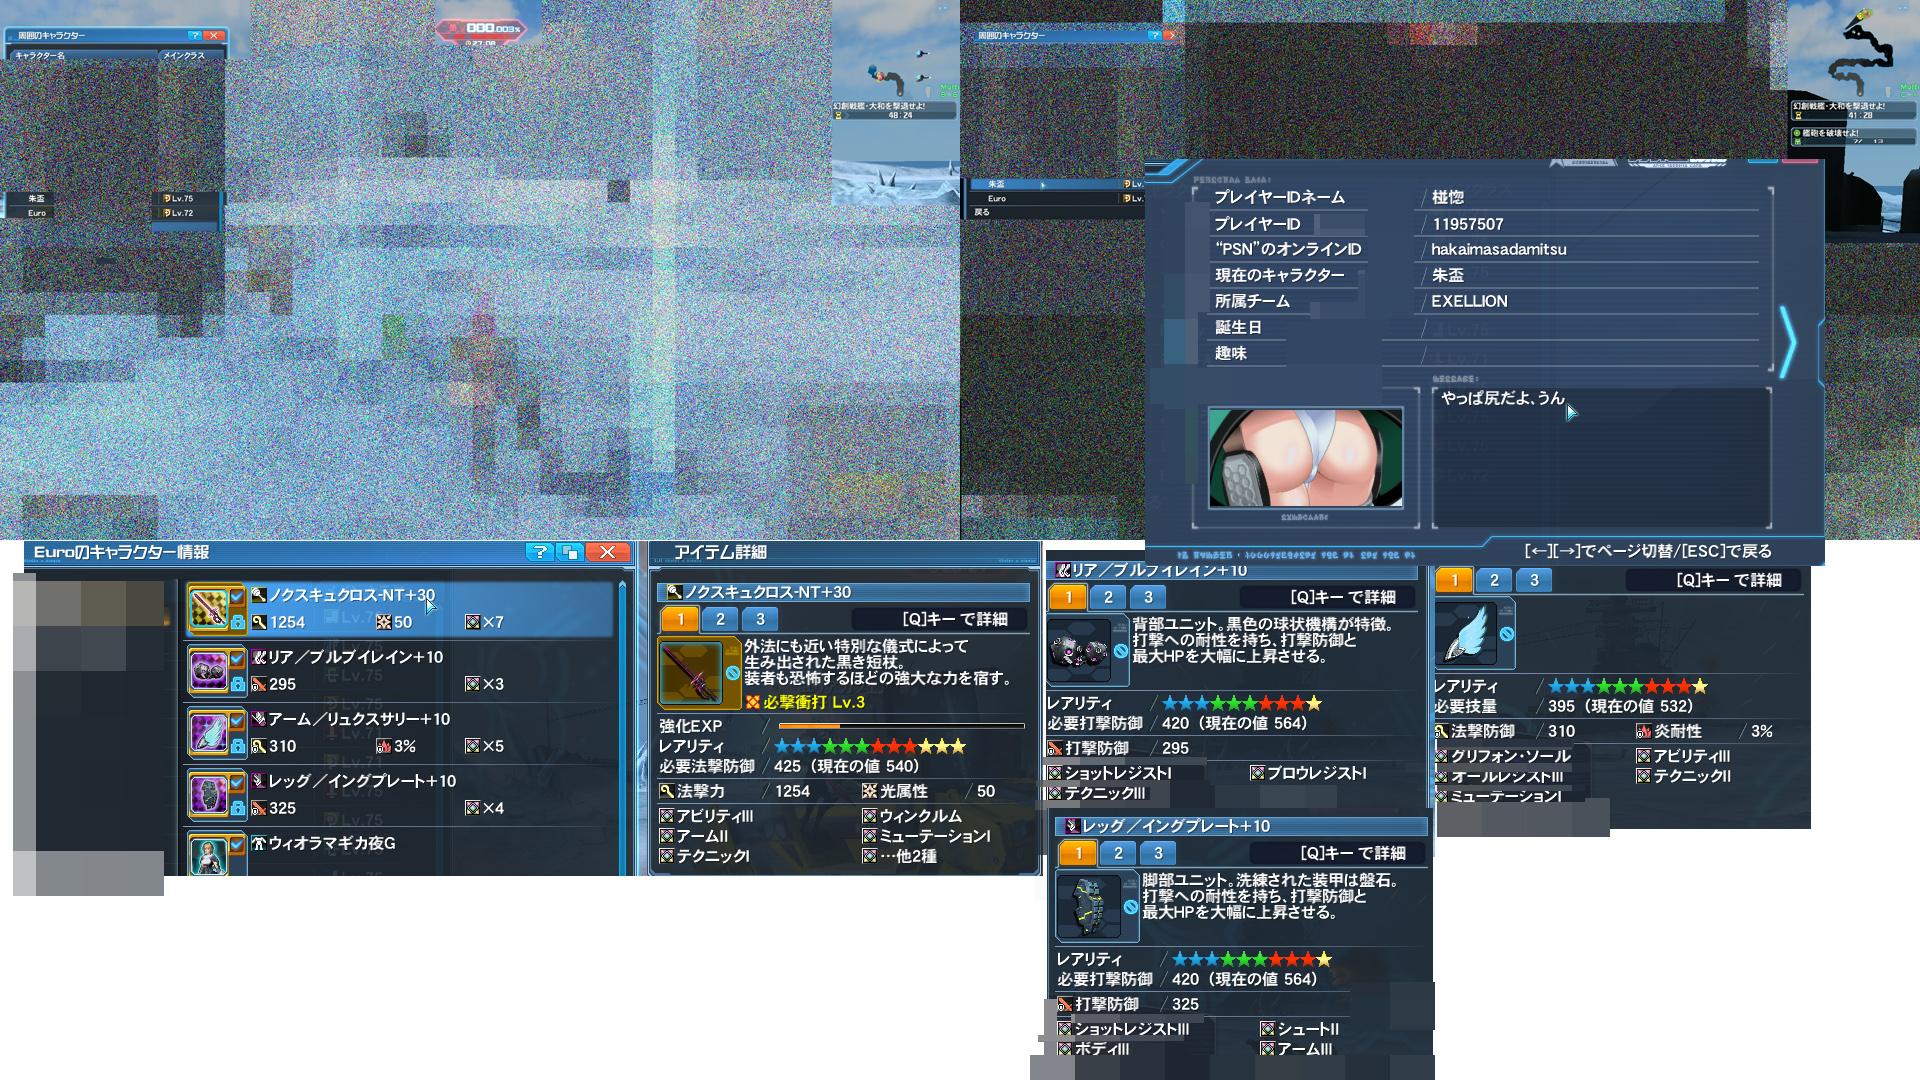 【PSO2】PHANTASY STAR ONLINE2 ship10 専スレ21 [無断転載禁止]©2ch.netYouTube動画>2本 ->画像>97枚